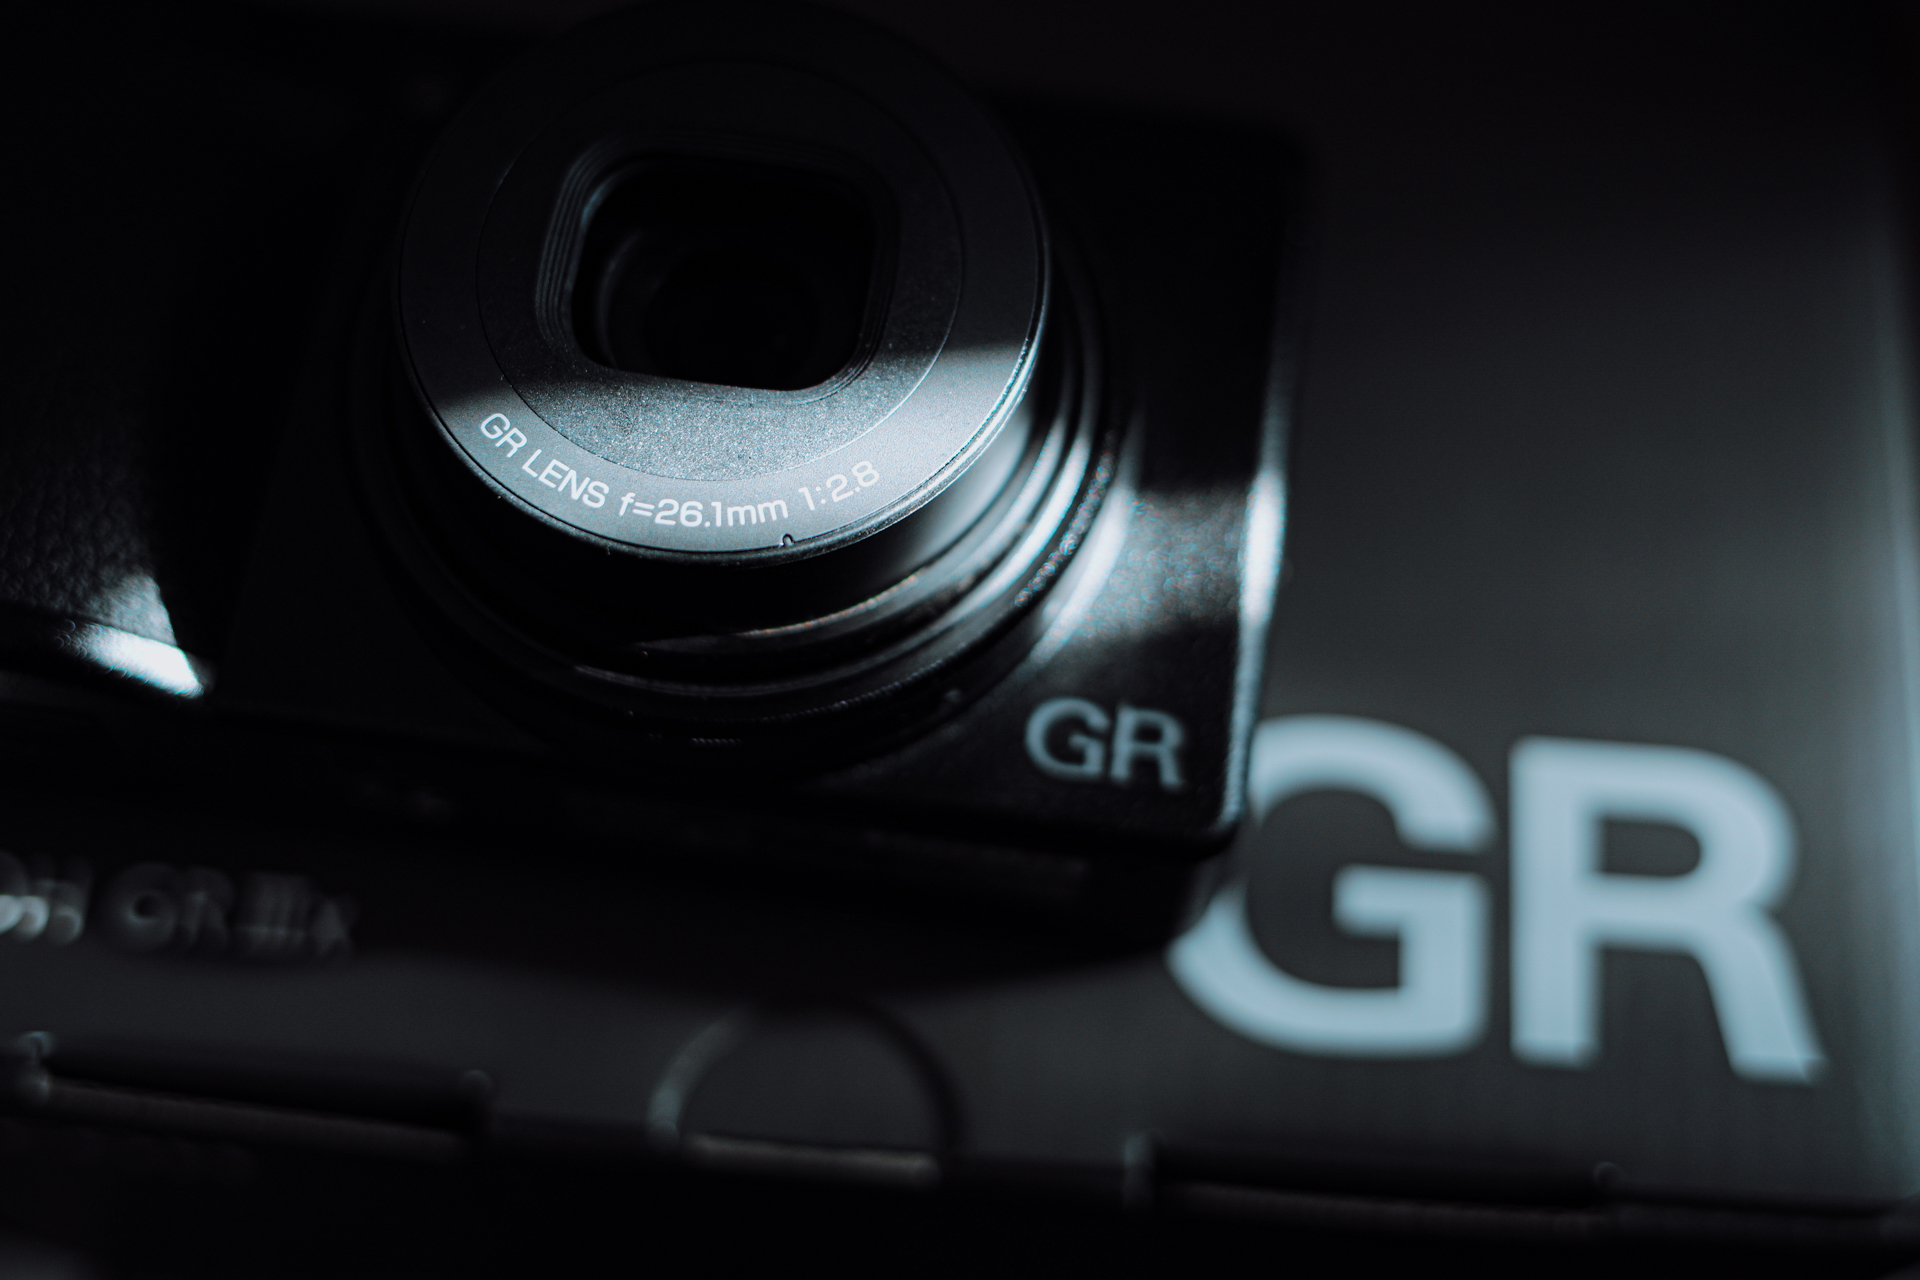 Ricoh GR IIIx GR3x 開箱評測 |看似吉光片羽的小確幸